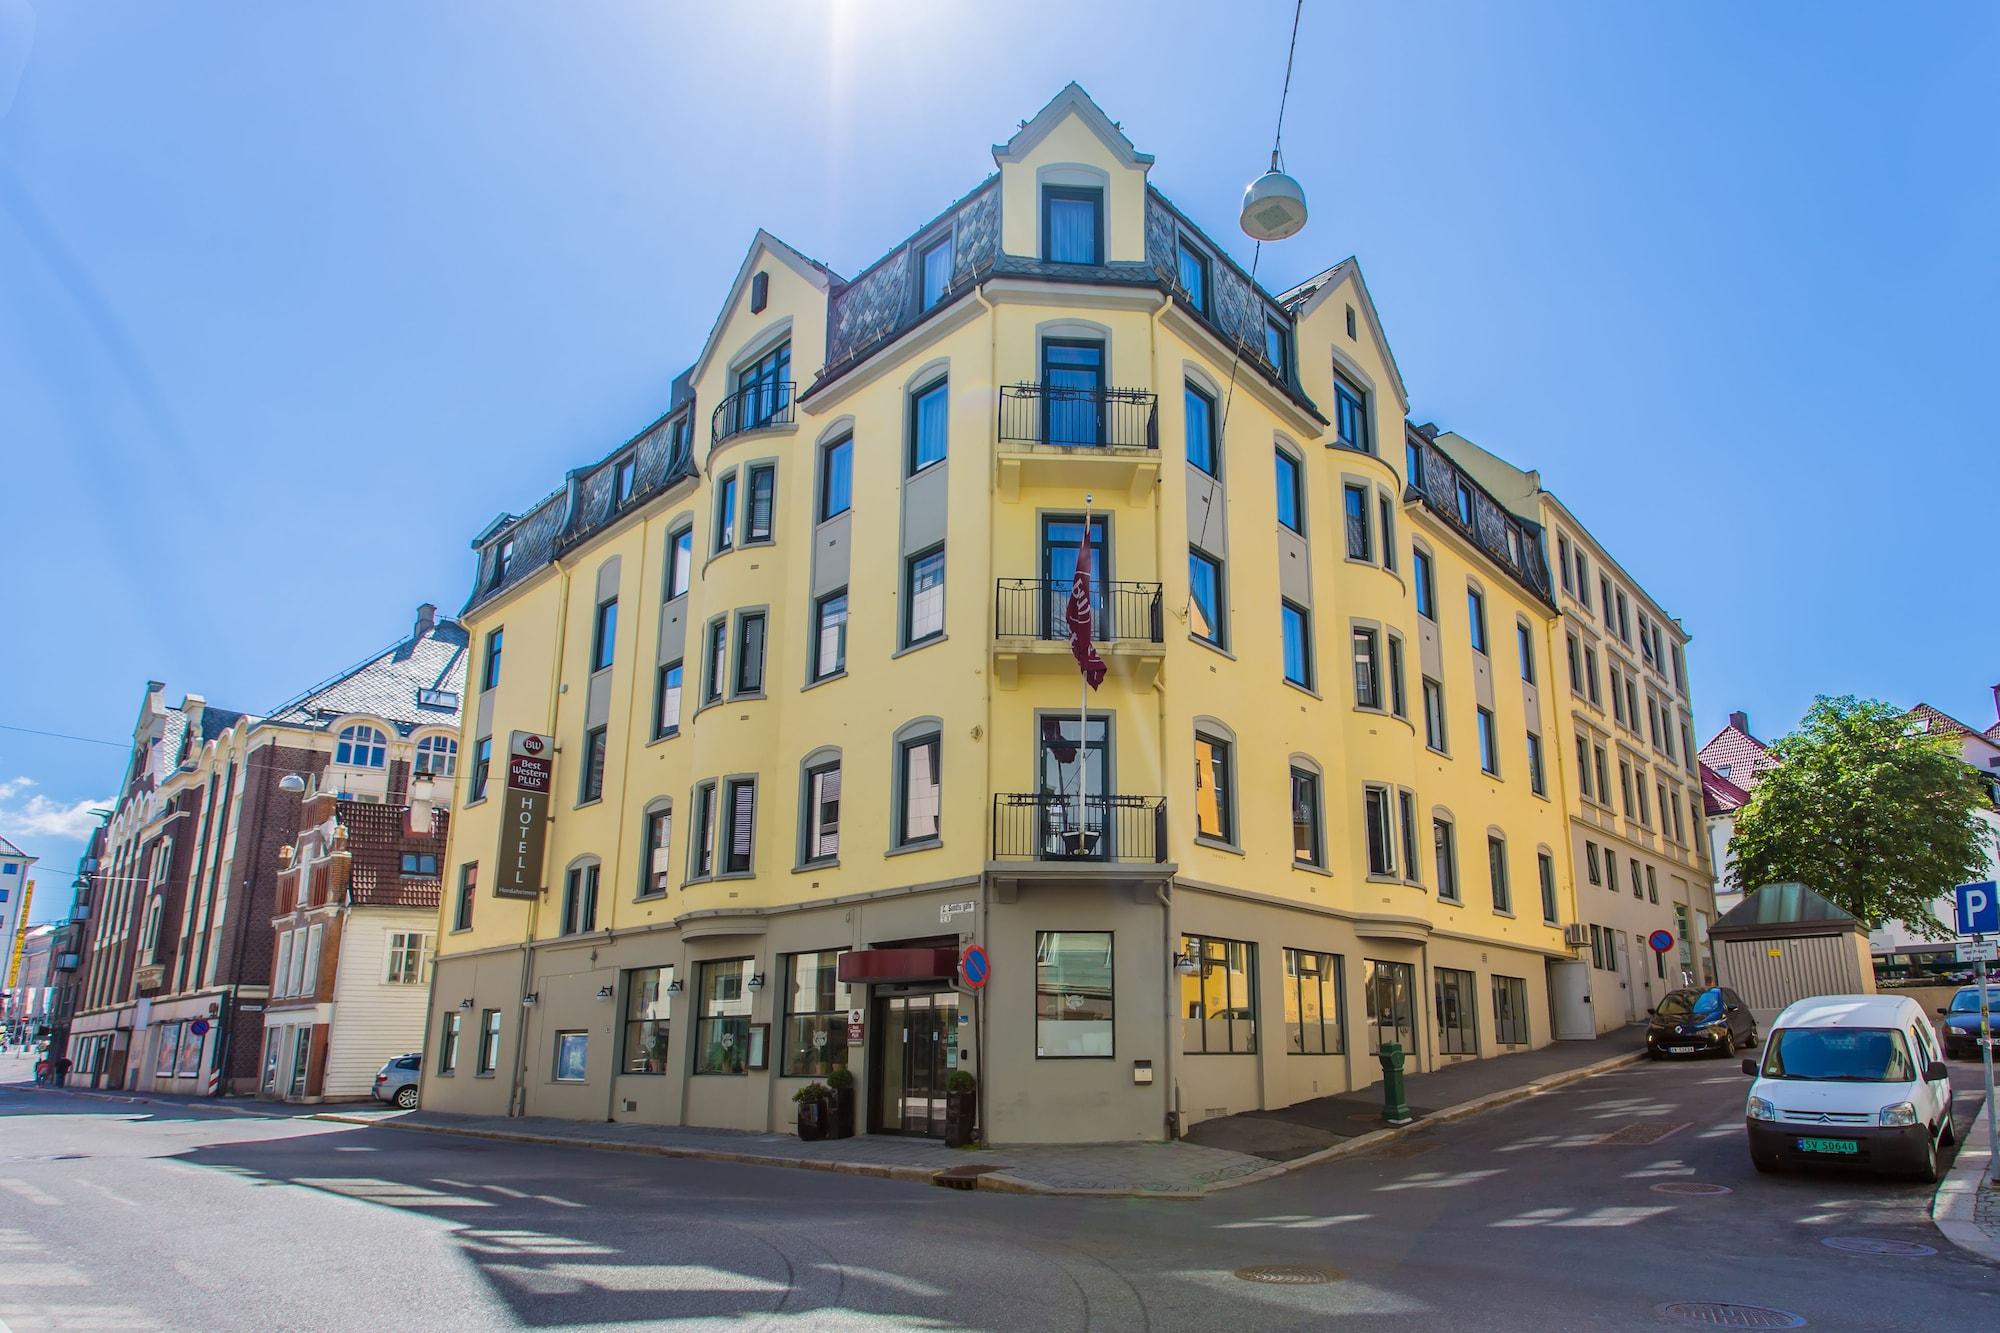 Best Western Plus Hotell Hordaheimen, Bergen